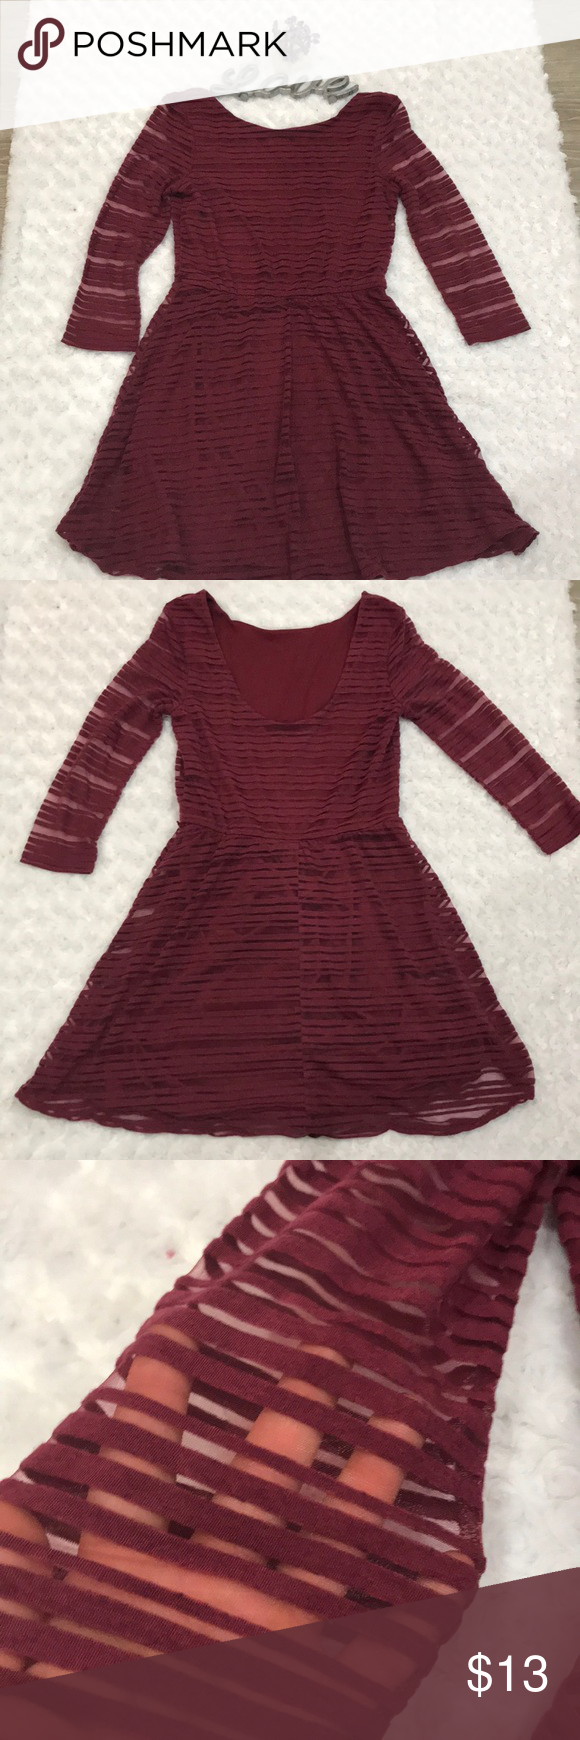 c8ff7928fa791b Lily Rose- Burgundy Dress - 3/4 Sleeve - Medium Cute dress, full ...